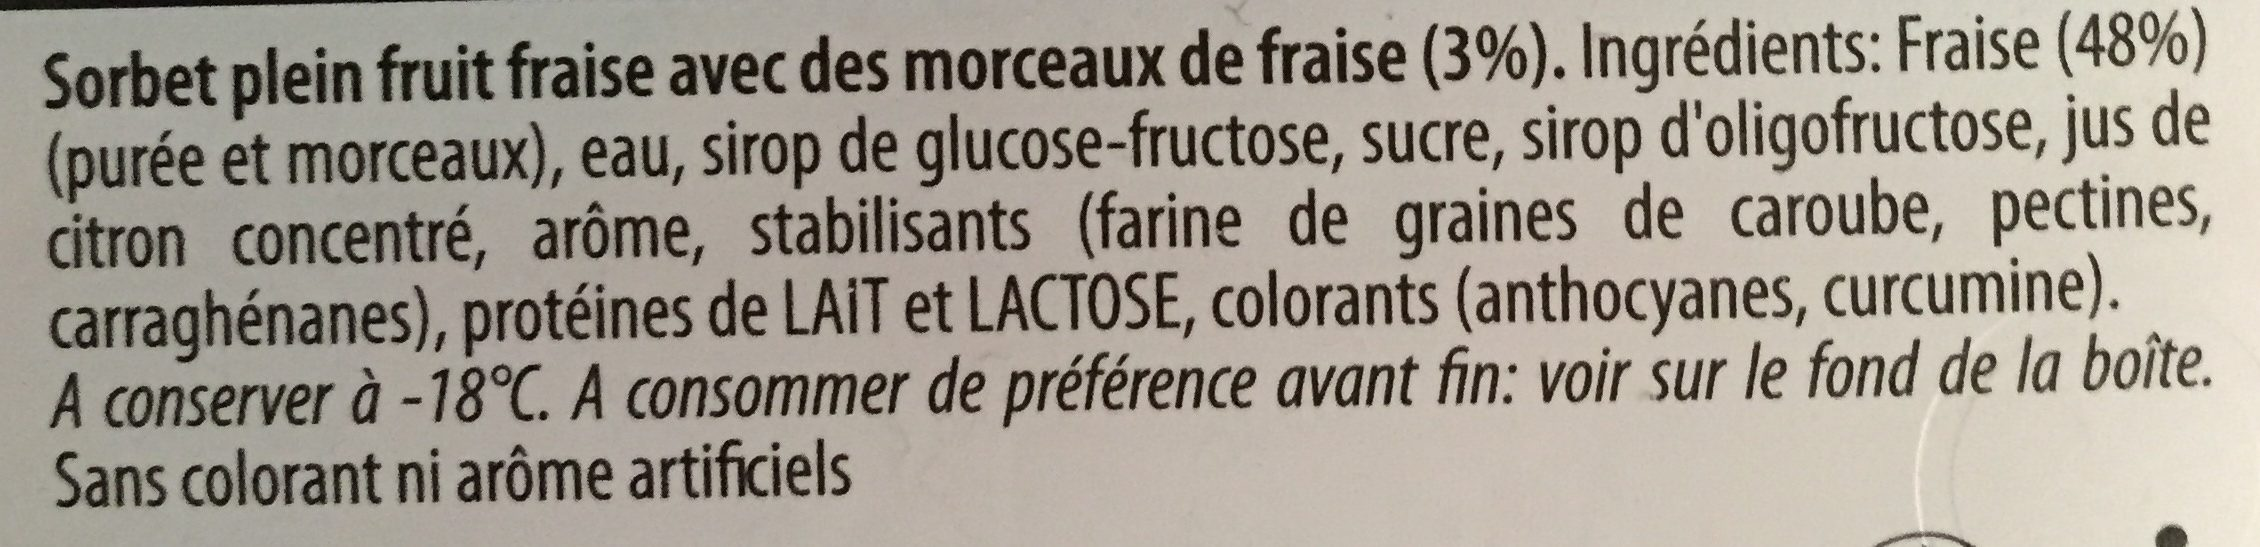 Sorbet Fraise - Ingredienti - fr